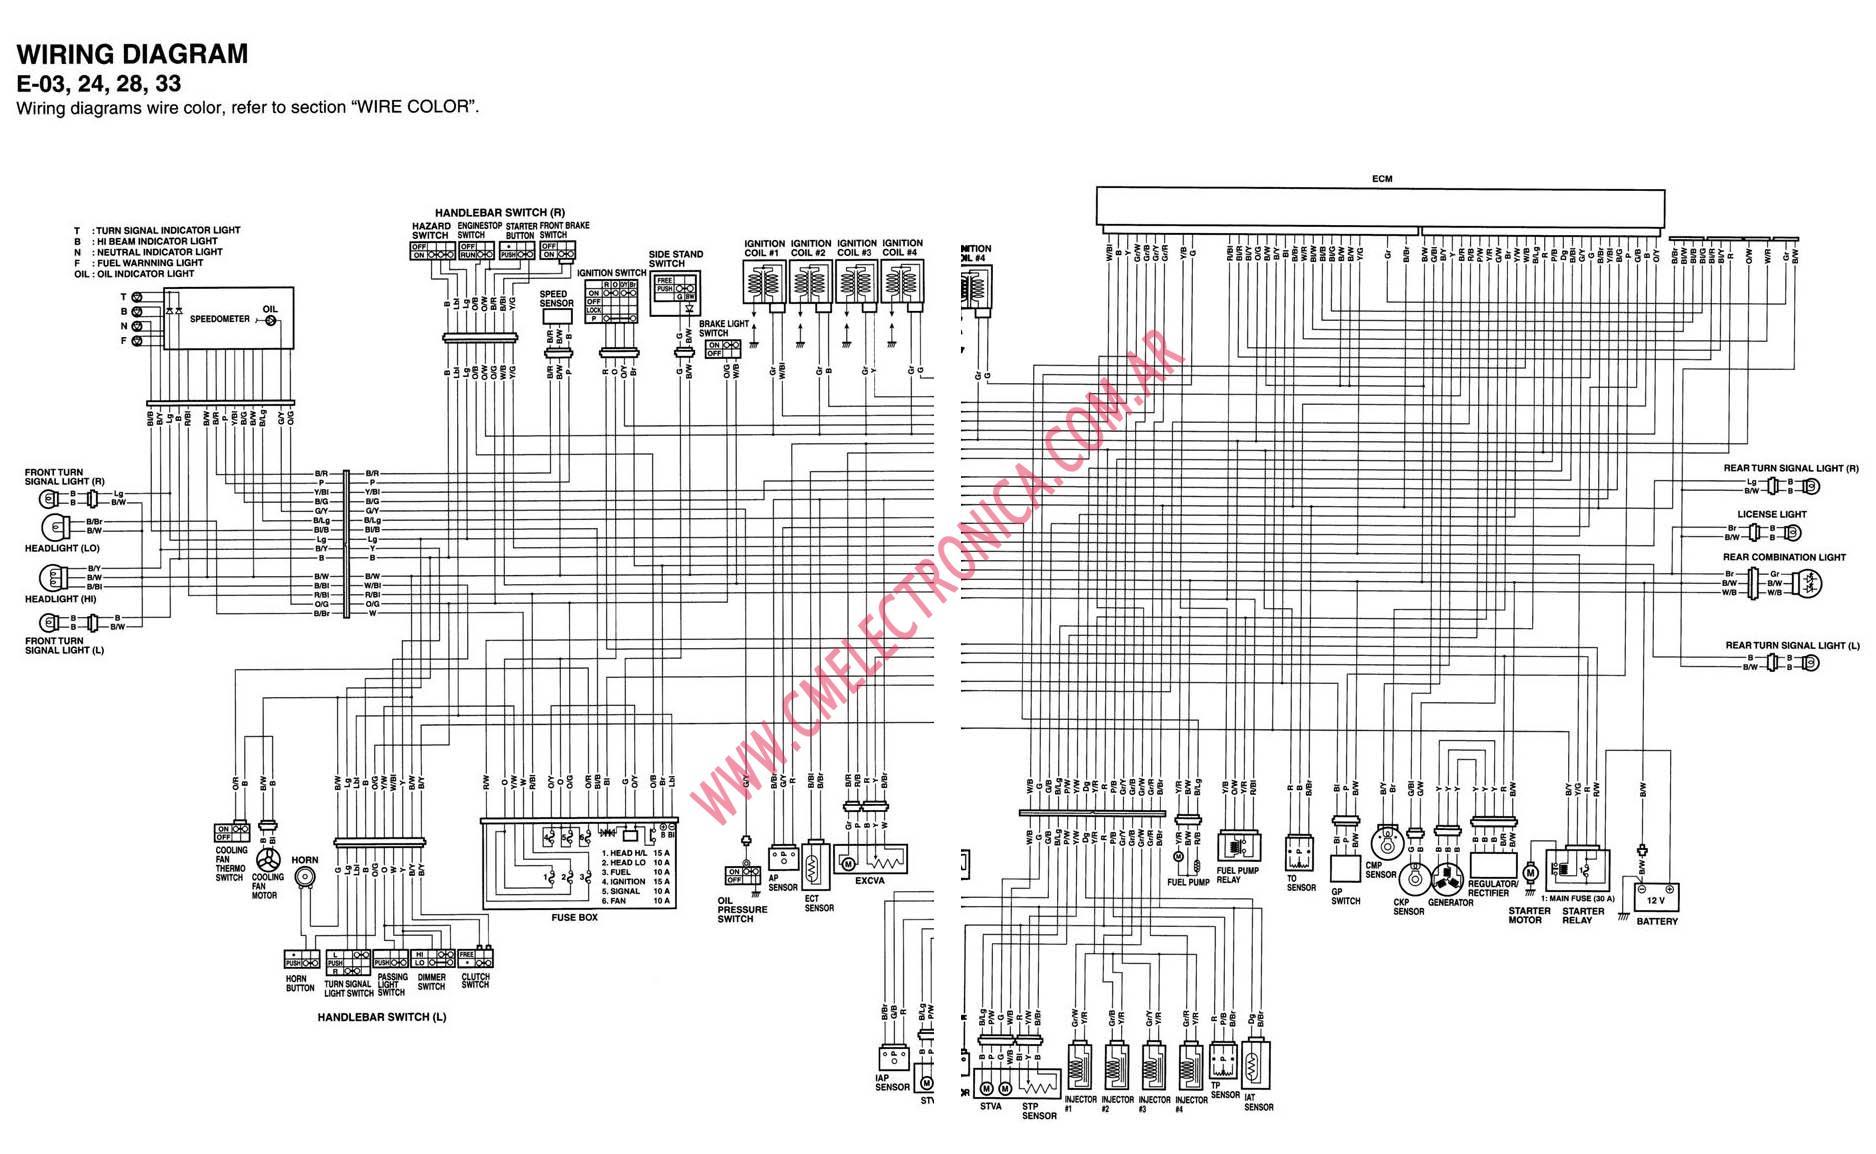 [SCHEMATICS_48EU]  05 Gsxr 600 Wiring Diagram 24vdc 5 Pole Relay Wiring Diagram -  polarisss.durian.astrea-construction.fr | 2007 Hayabusa Wiring Diagram |  | Begeboy Wiring Diagram Source - ASTREA CONSTRUCTION